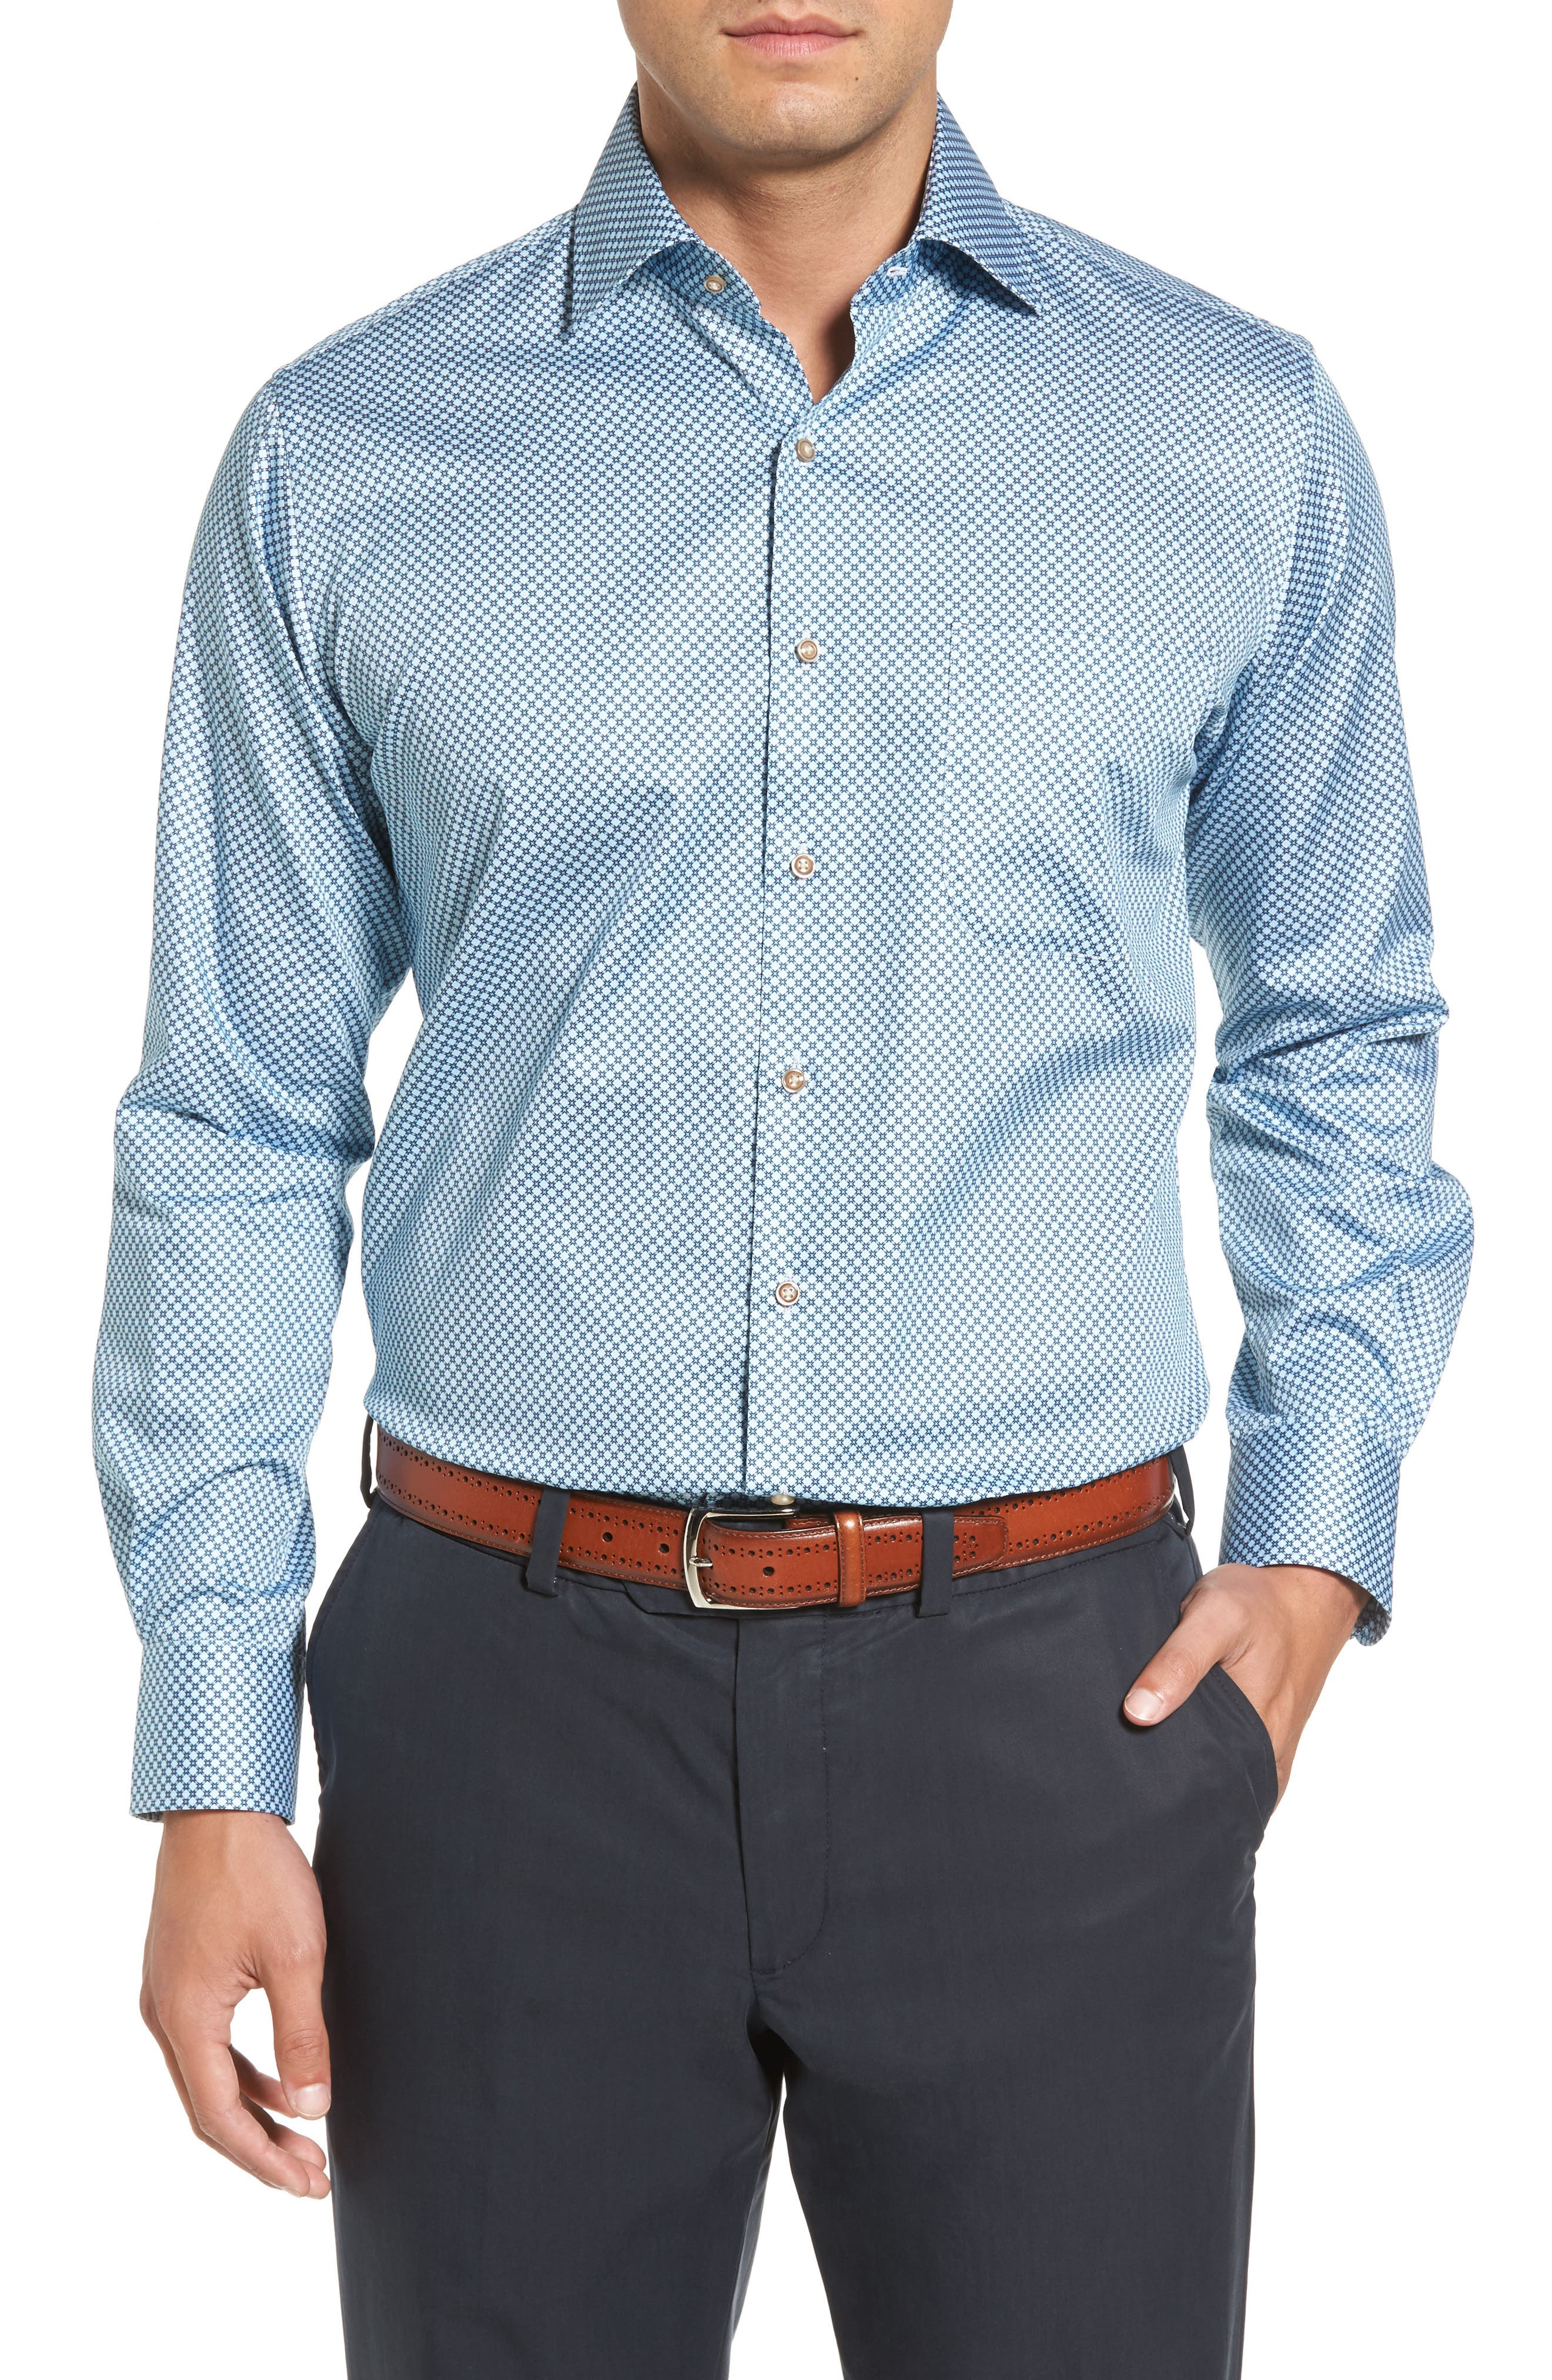 Alternate Image 1 Selected - Peter Millar Pandora's Box Regular Fit Sport Shirt